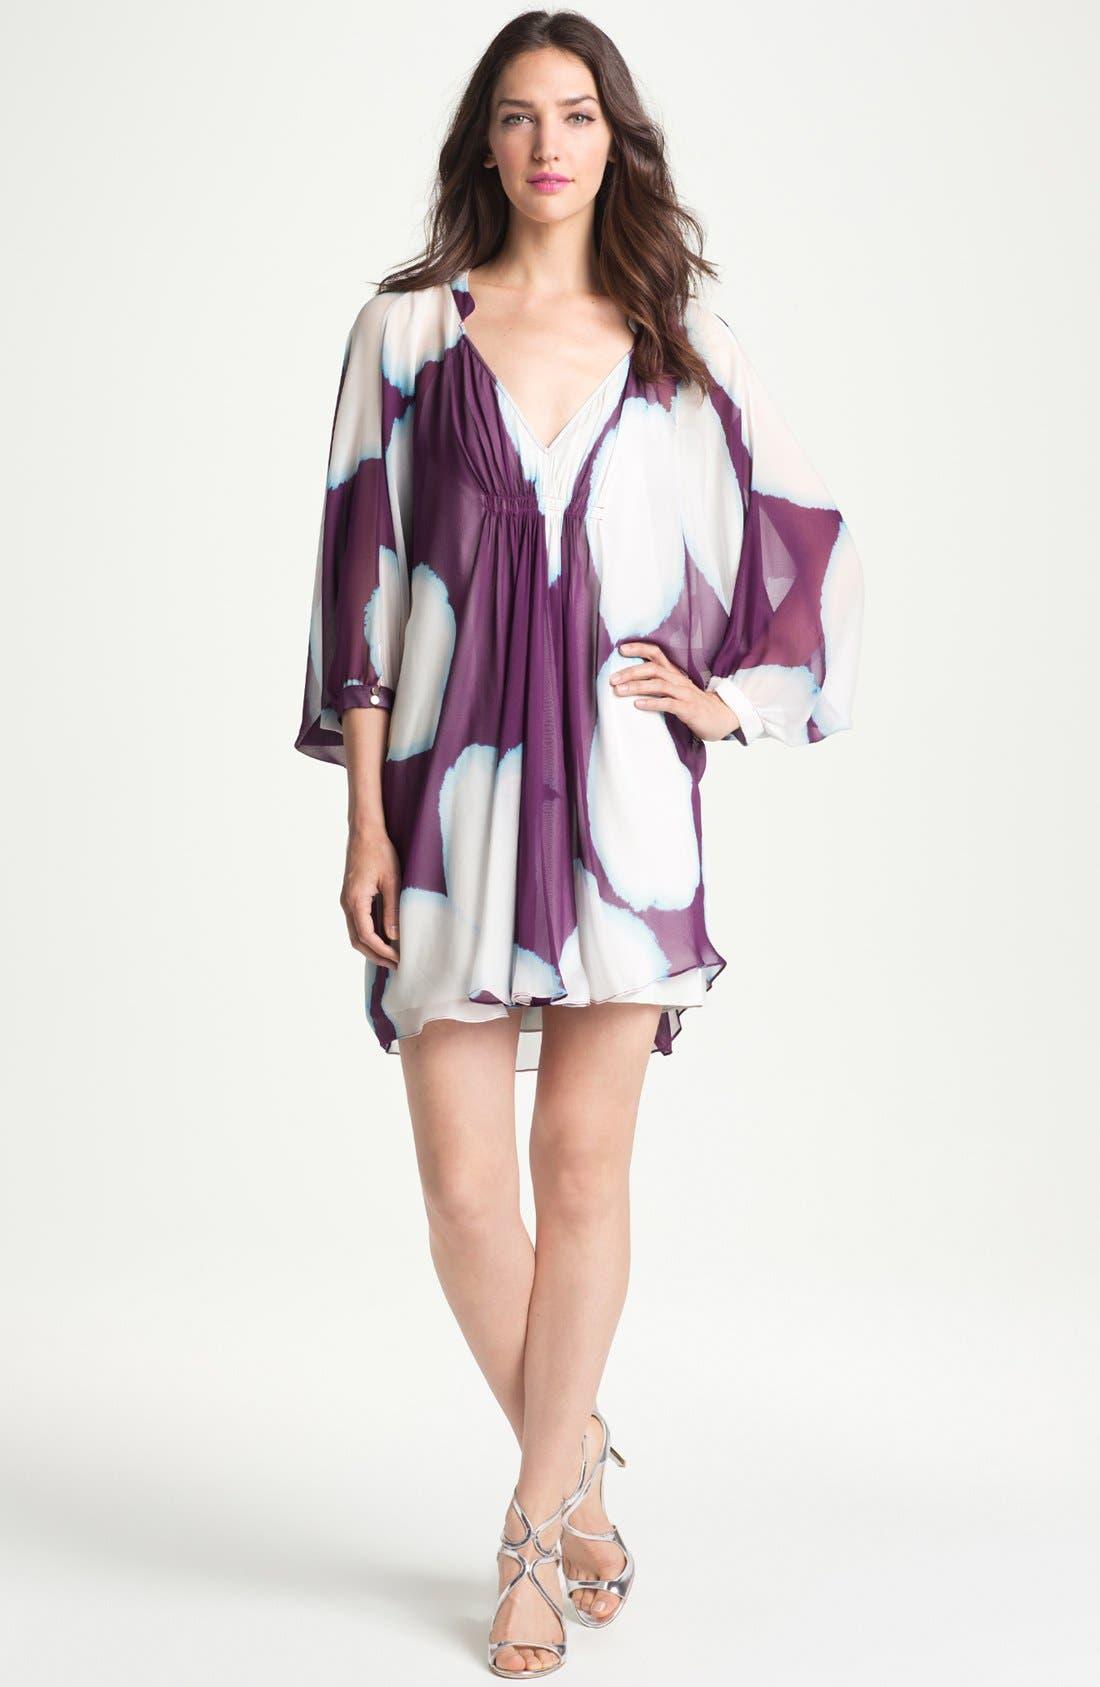 Alternate Image 1 Selected - Diane von Furstenberg 'Fleurette' Print Silk Caftan Dress